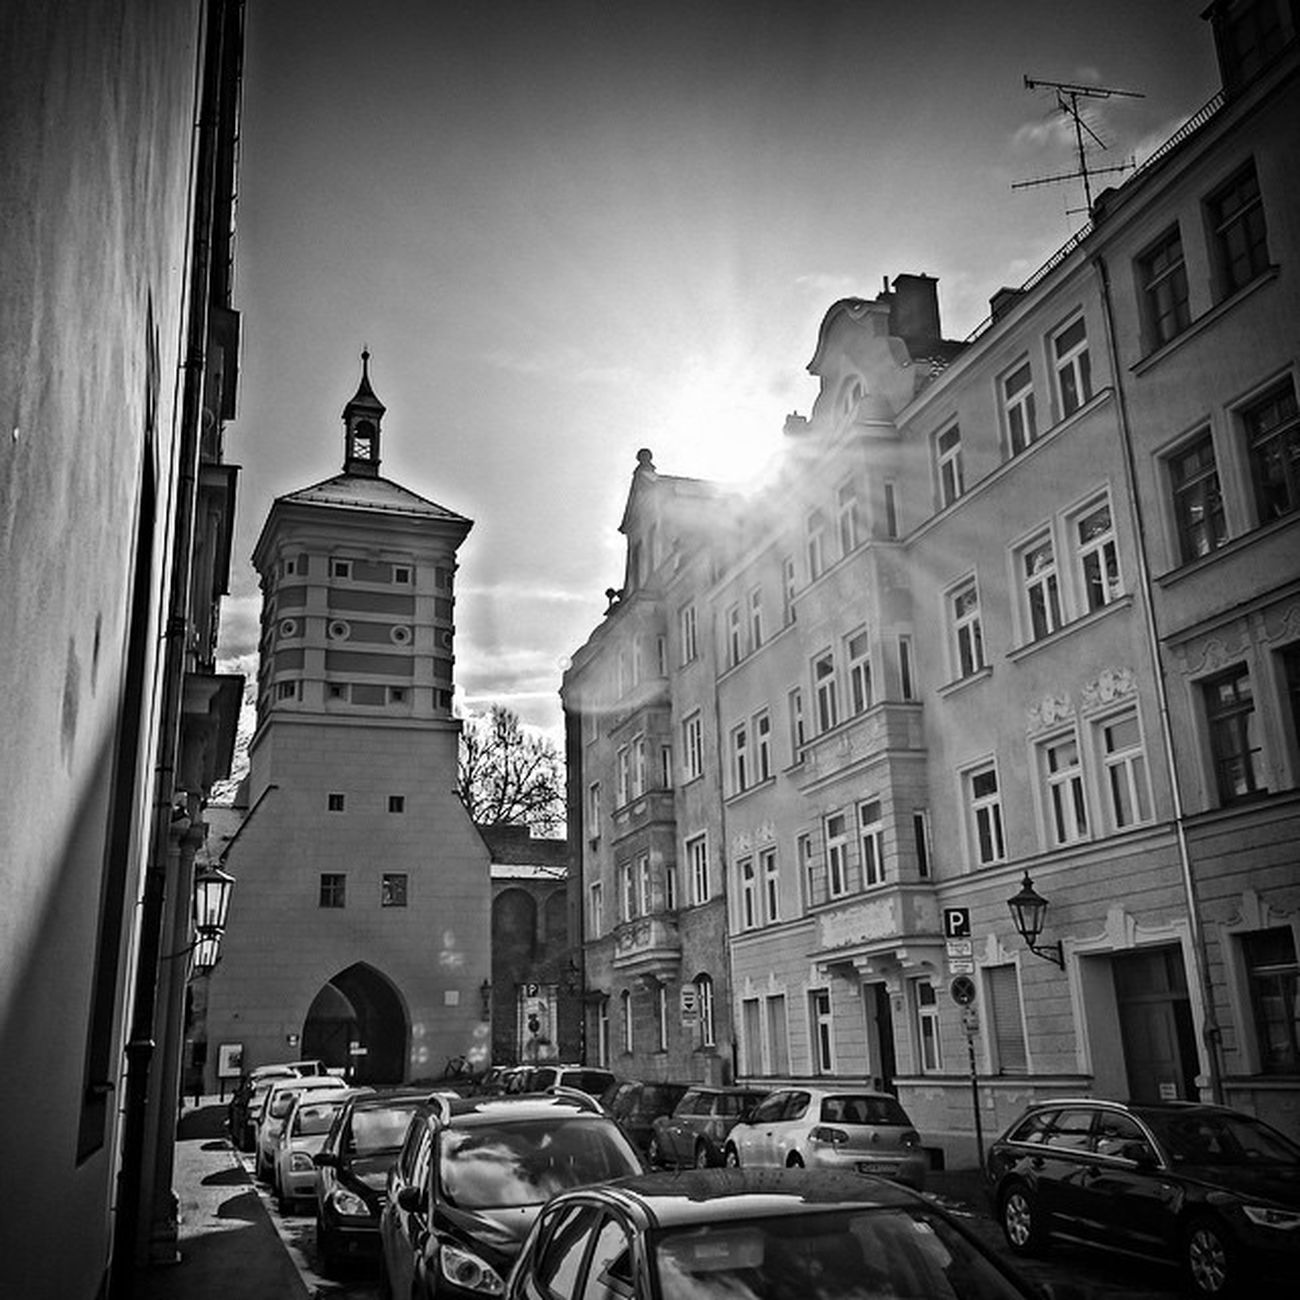 Sun Sonne HDR Bw Augsburg Hydra Photoshopexpress Rotestor